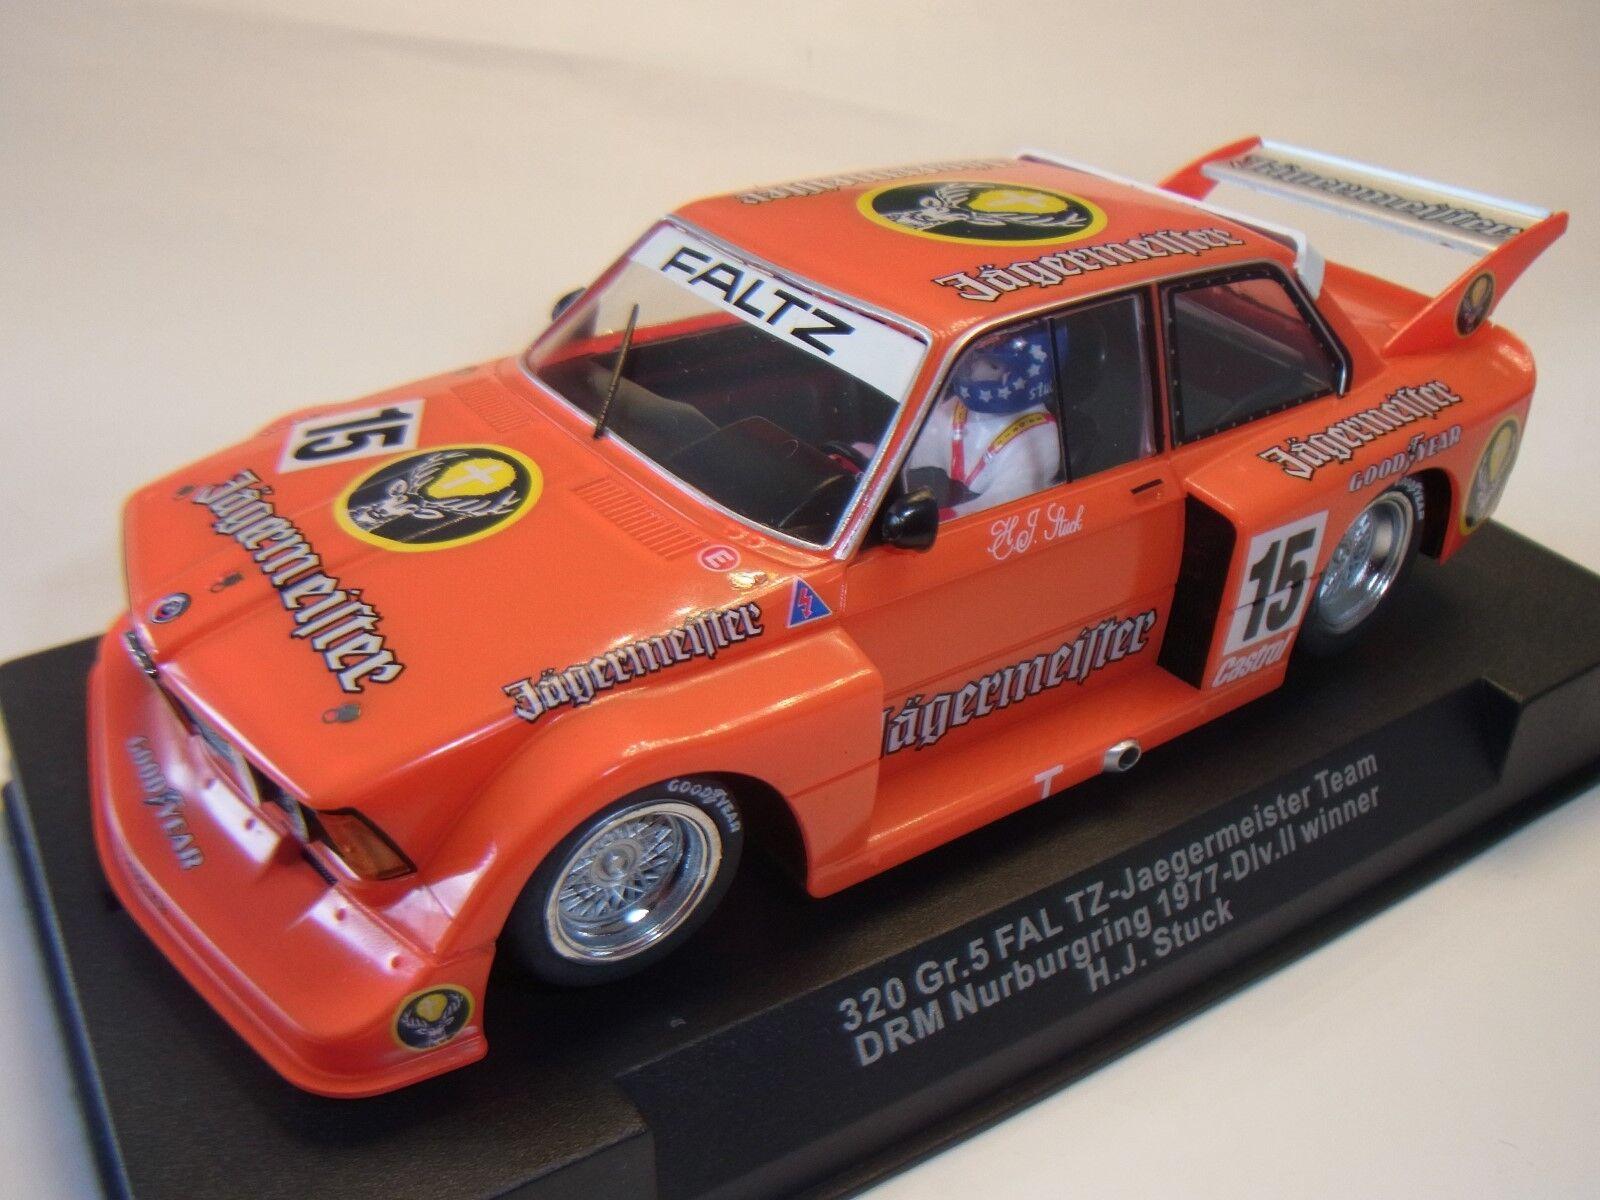 Sideways by Racer BMW 320 H. J. Piece Team Jägermeister SW41B Slot Car Racing